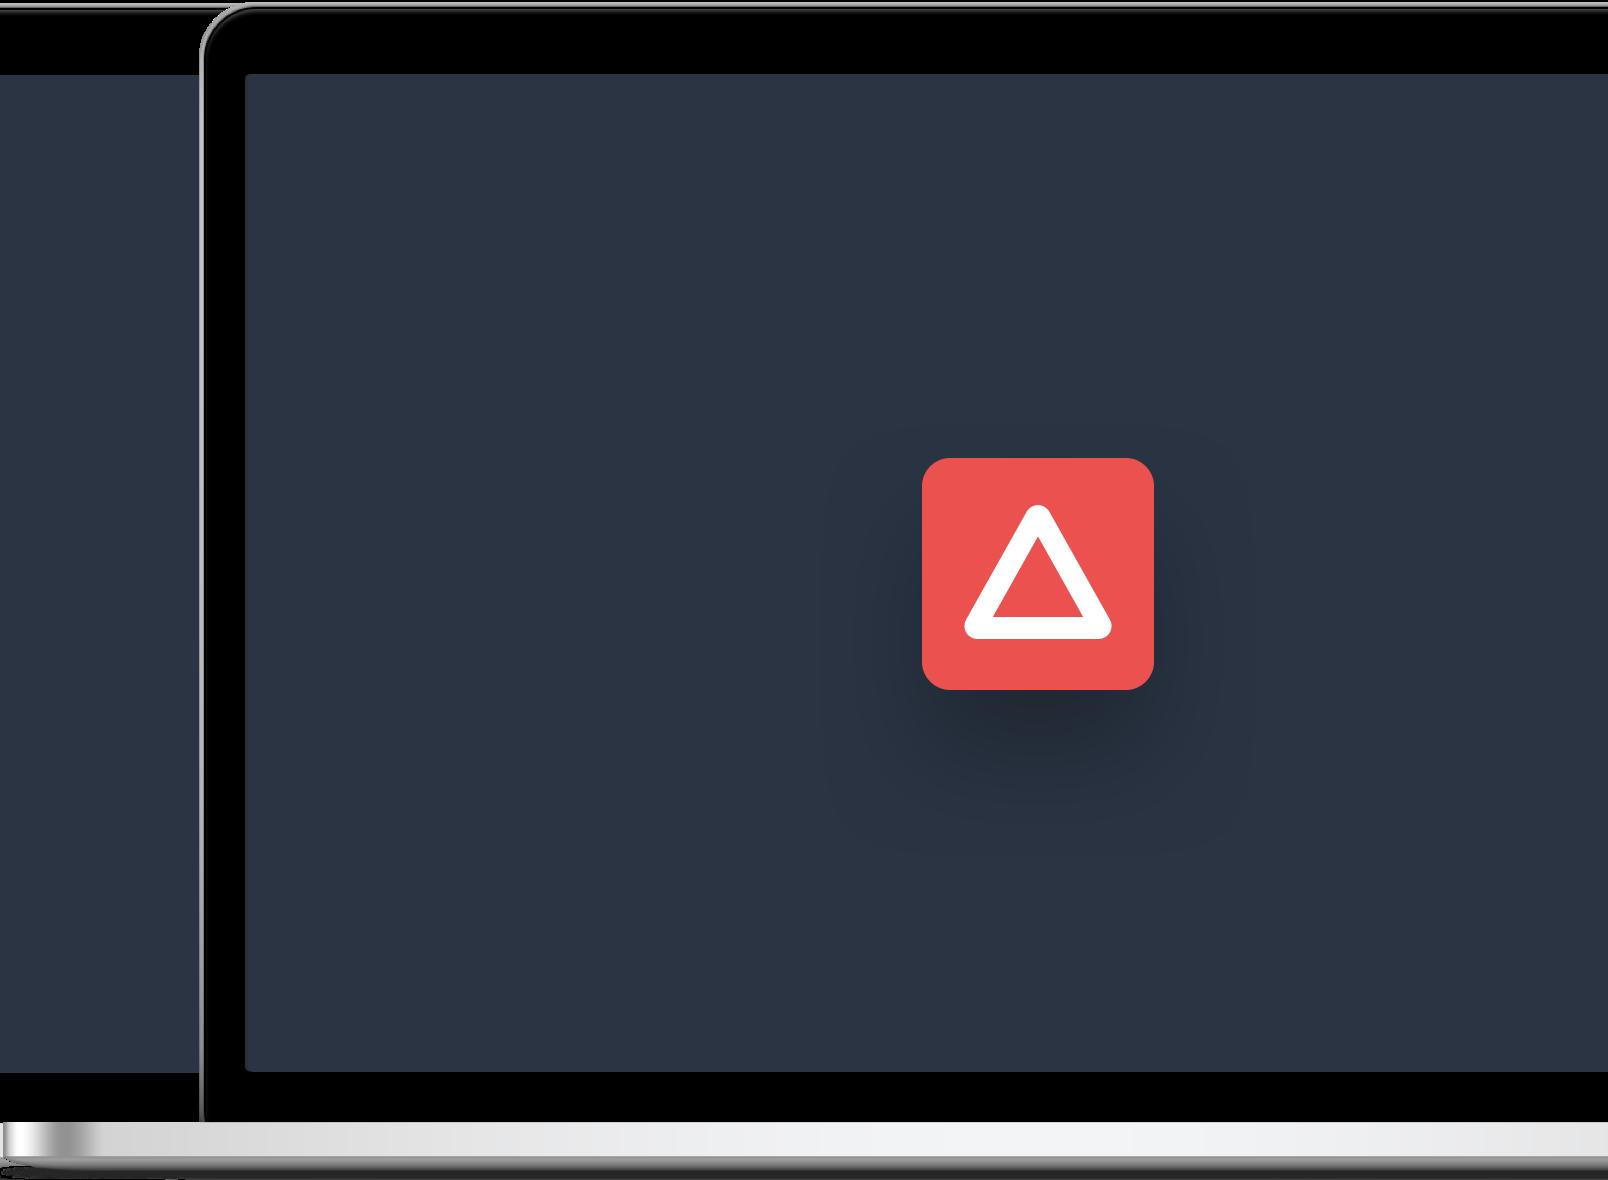 Image web developer